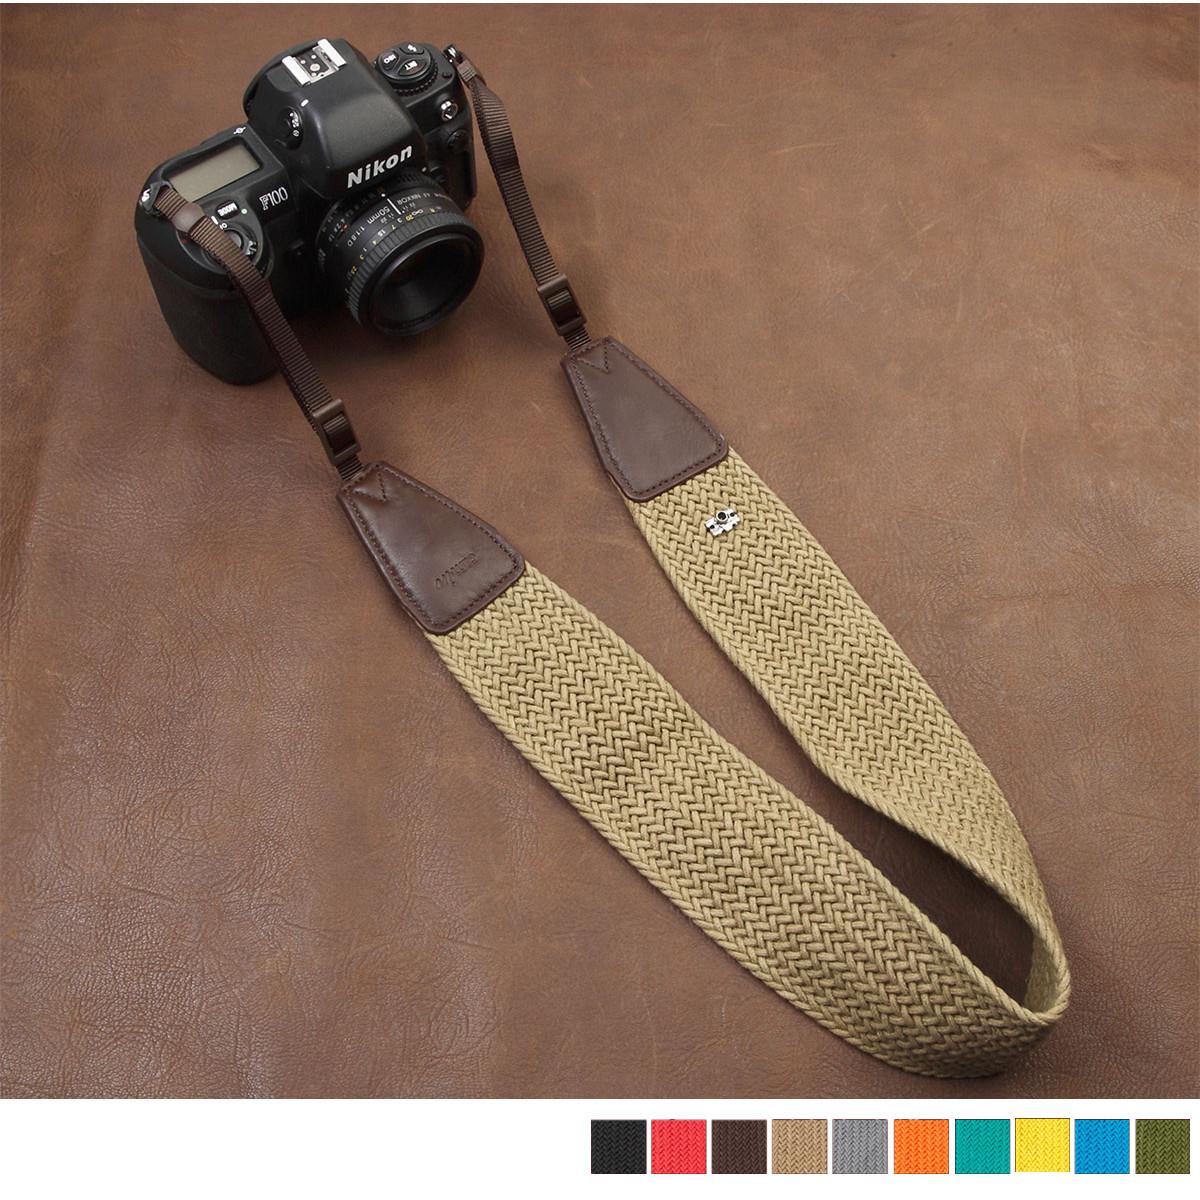 cam-in单反数码照相机背带 适用佳能尼康微单摄影徕卡肩带cam8605